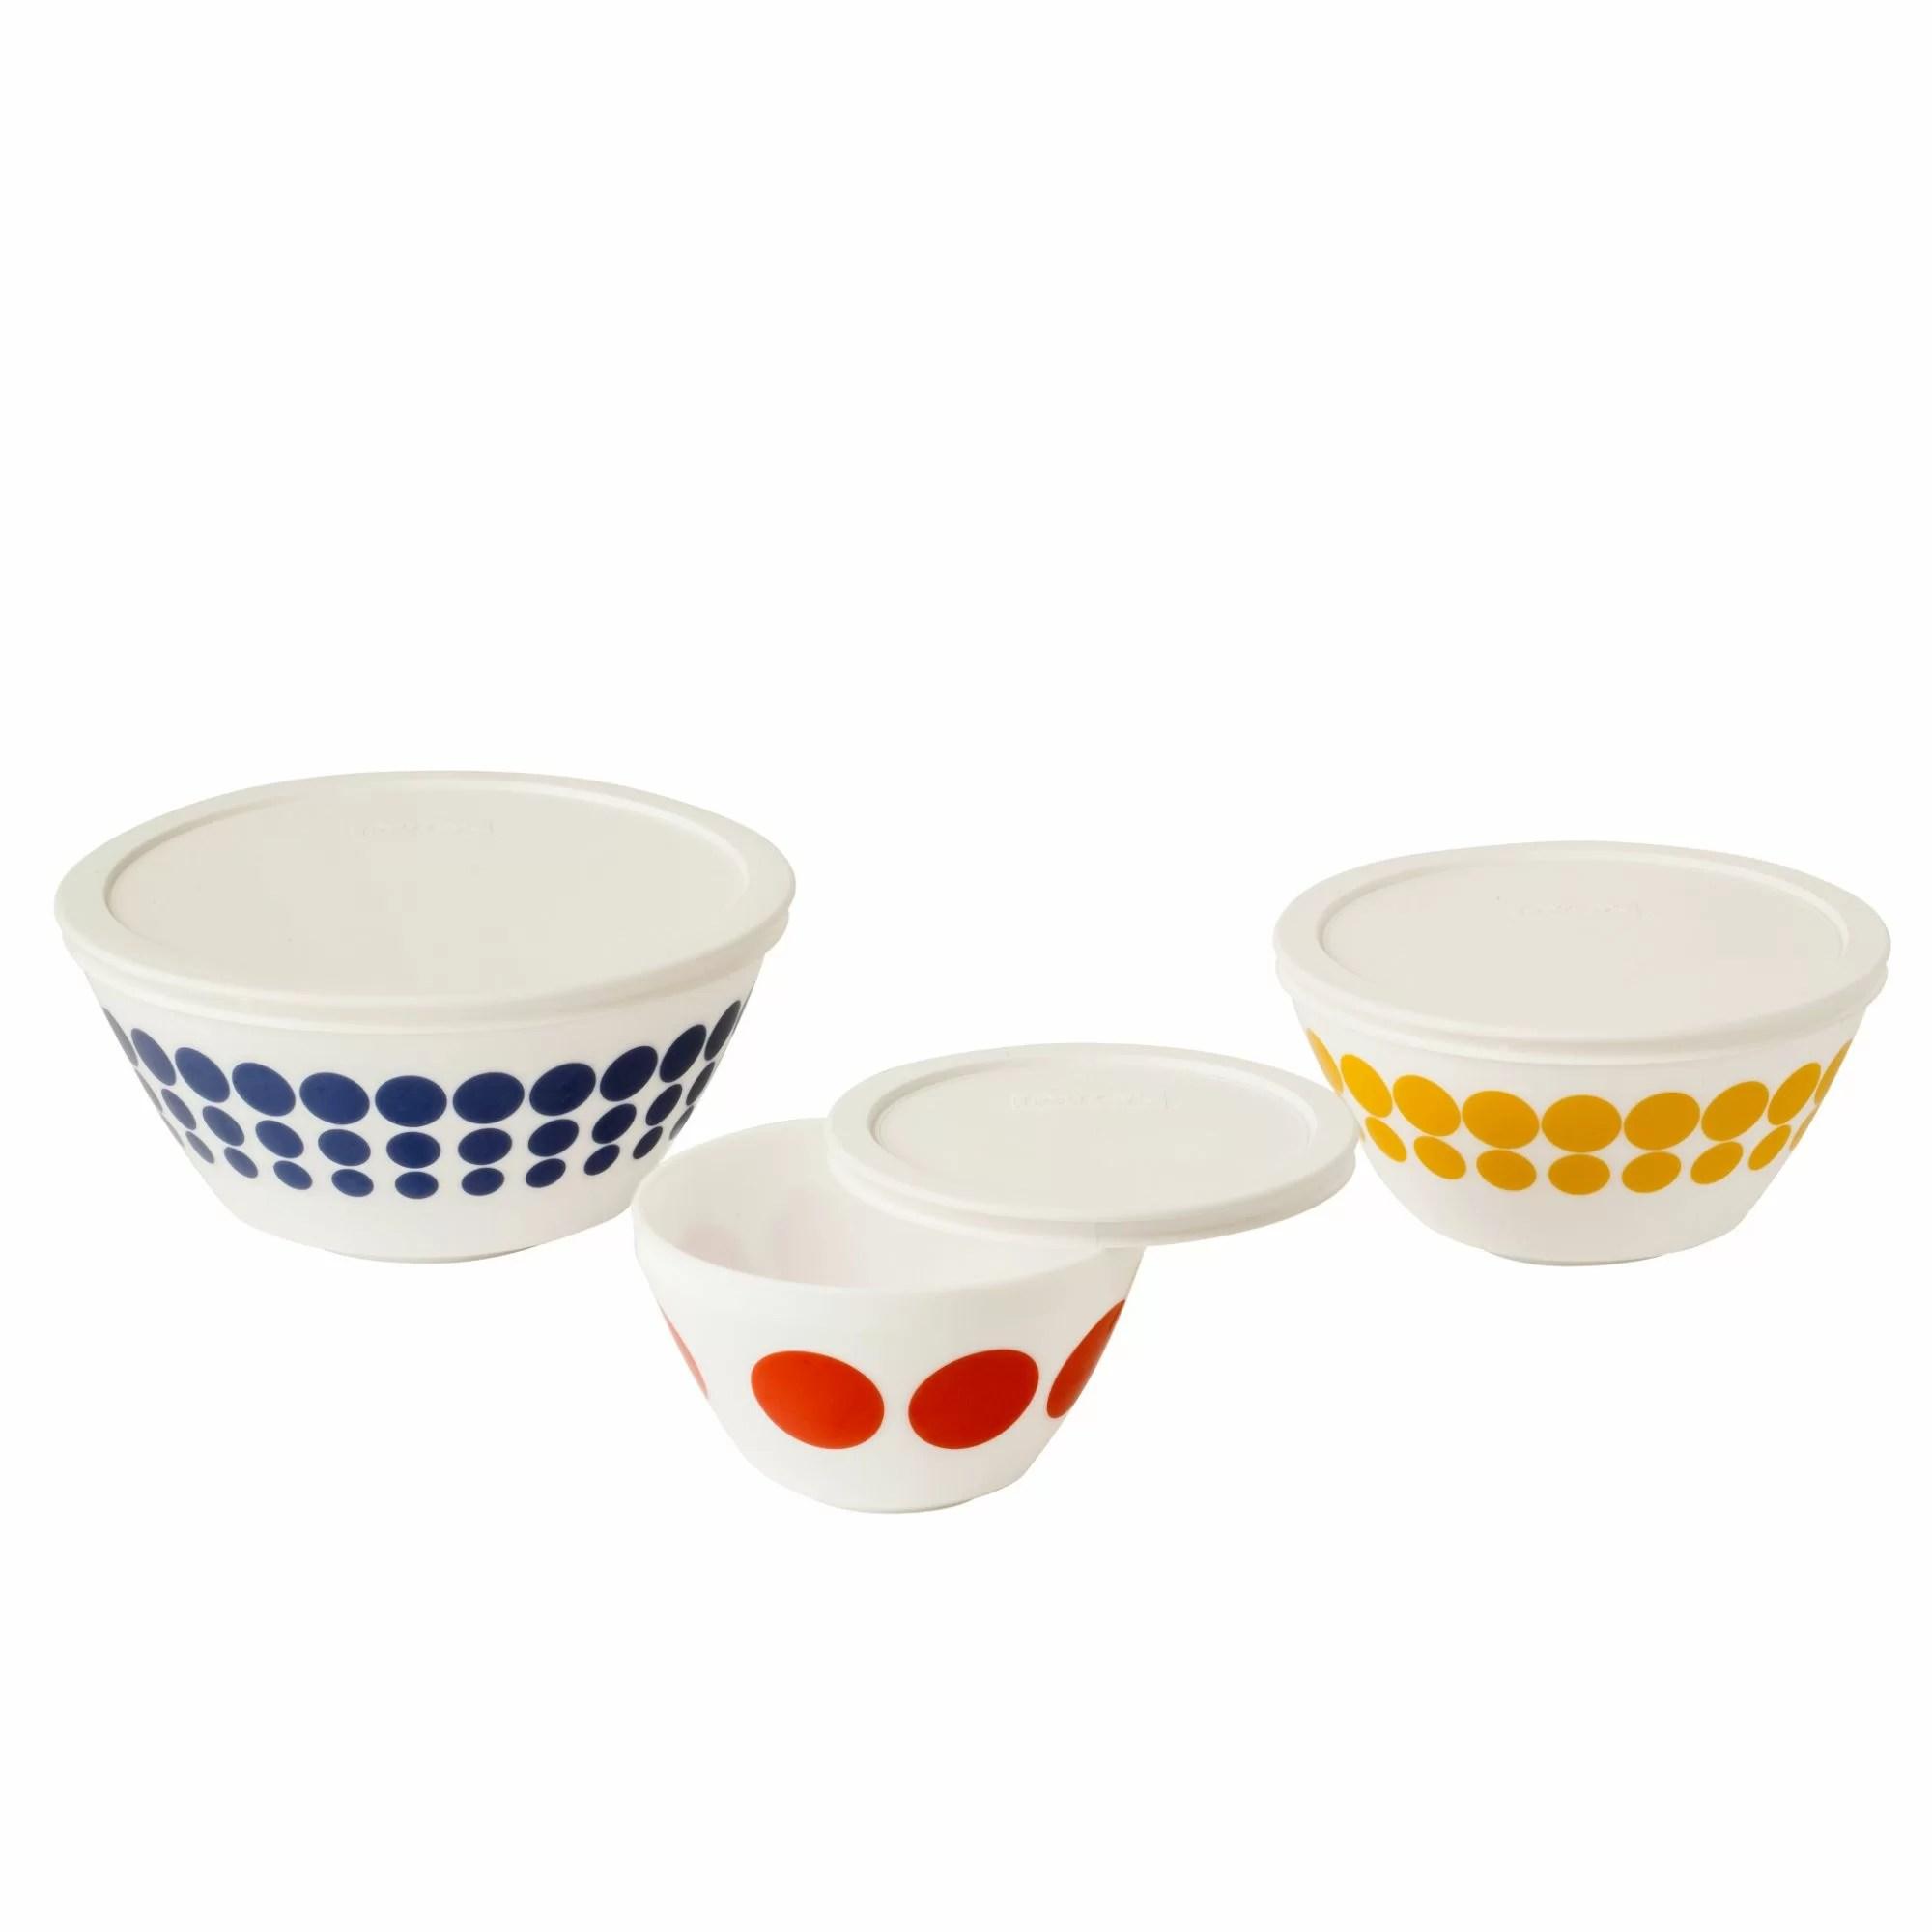 Pyrex 6 Piece Vintage Charm Spot on Mixing Bowl Set